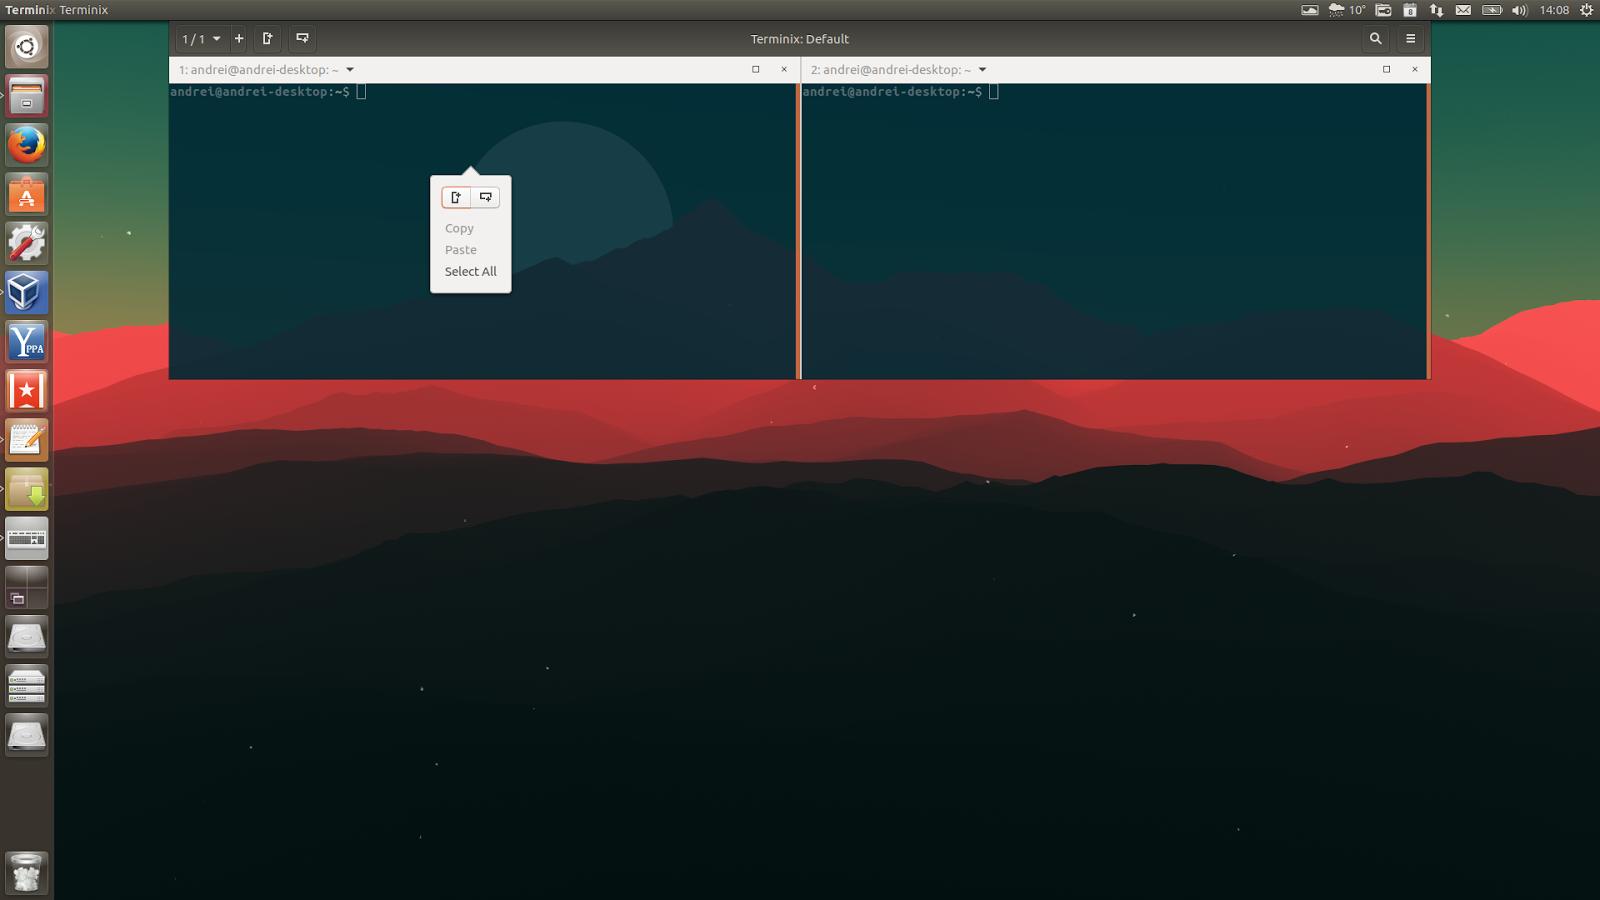 Tilix (Previously Terminix) 1 3 5 Released With Quake Mode